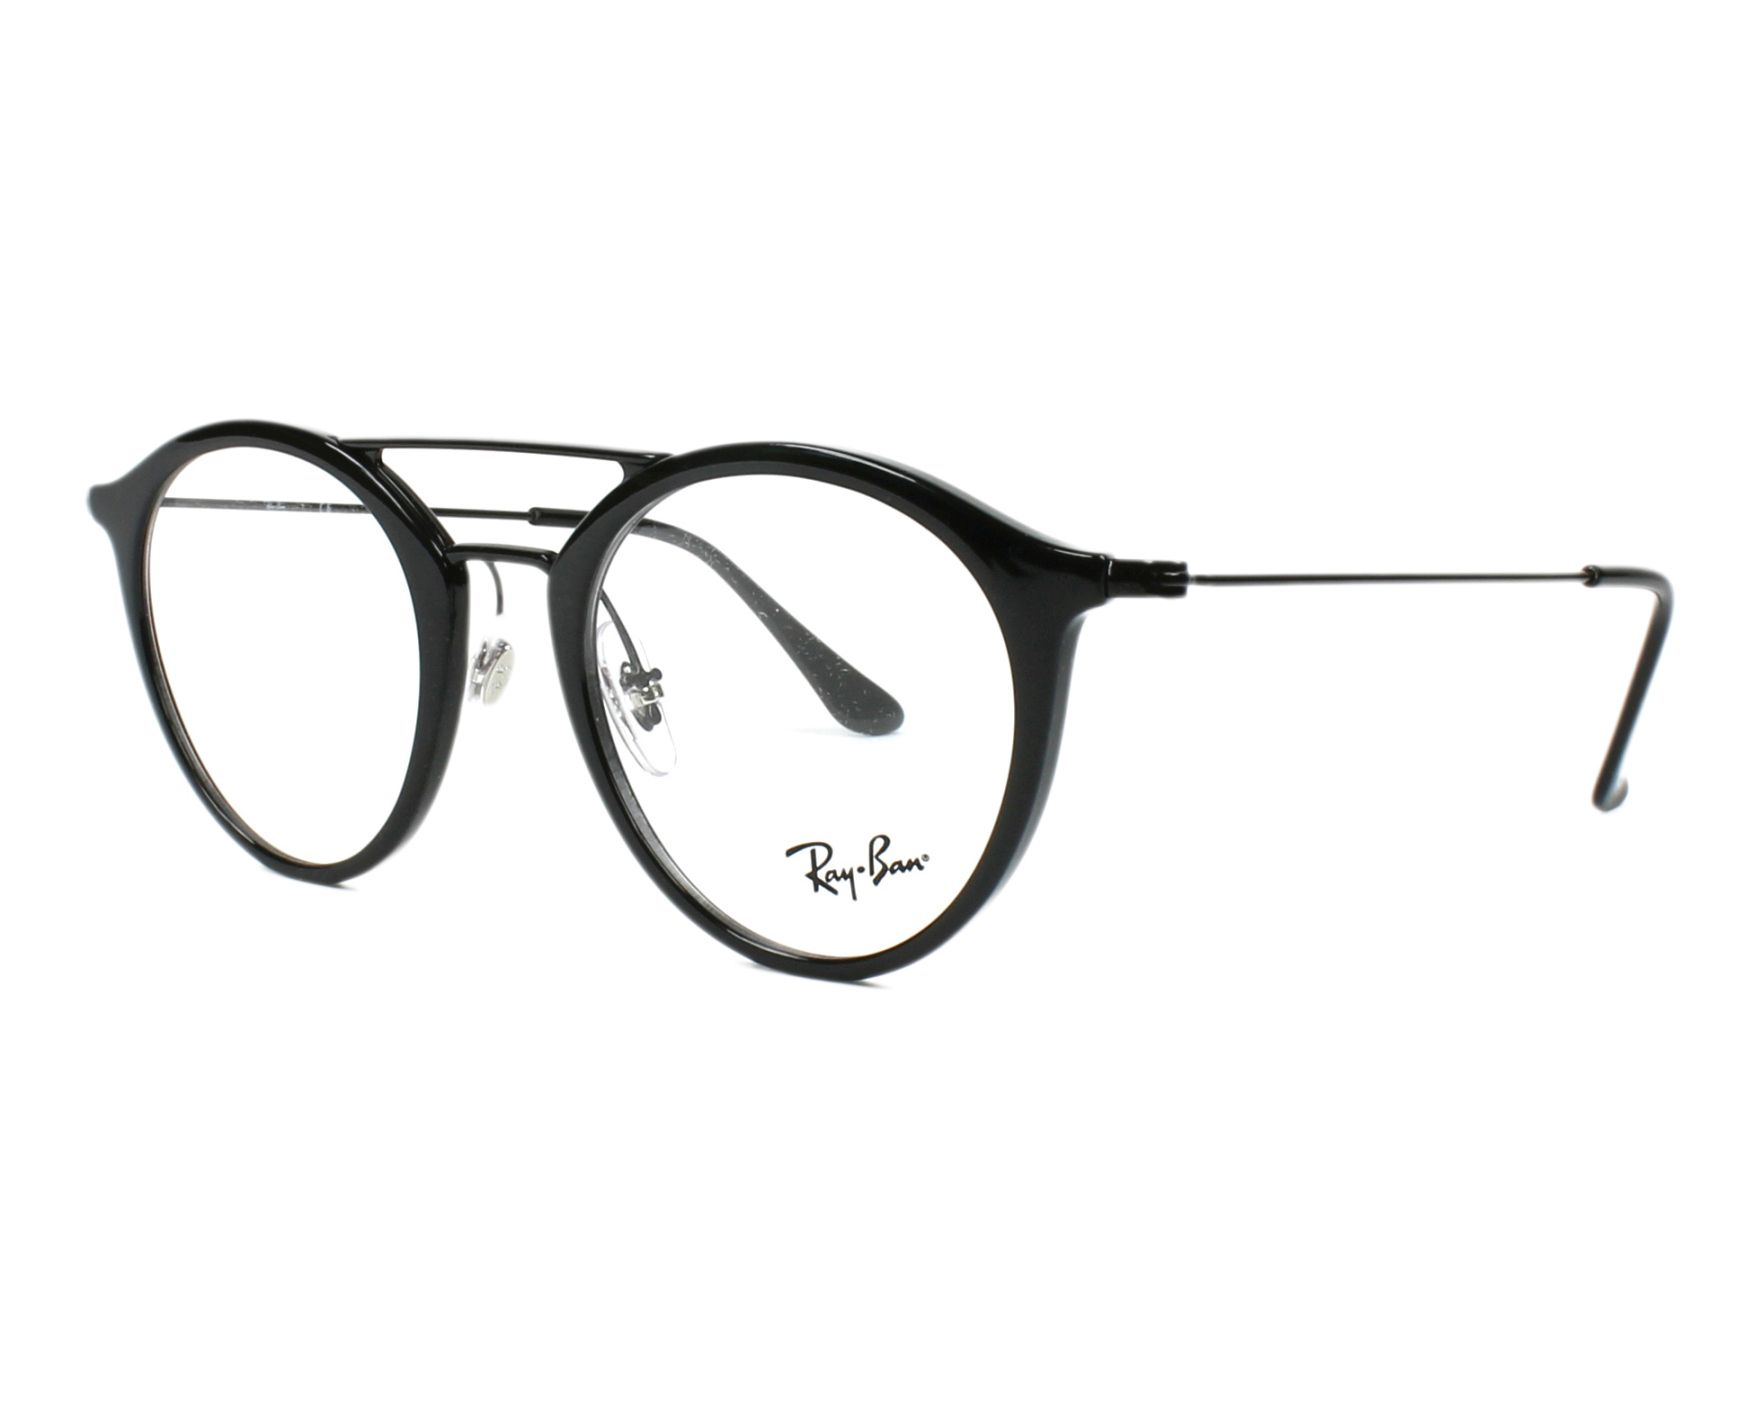 10ea36d7805 eyeglasses Ray-Ban RX-7097 5725 47-21 Black profile view